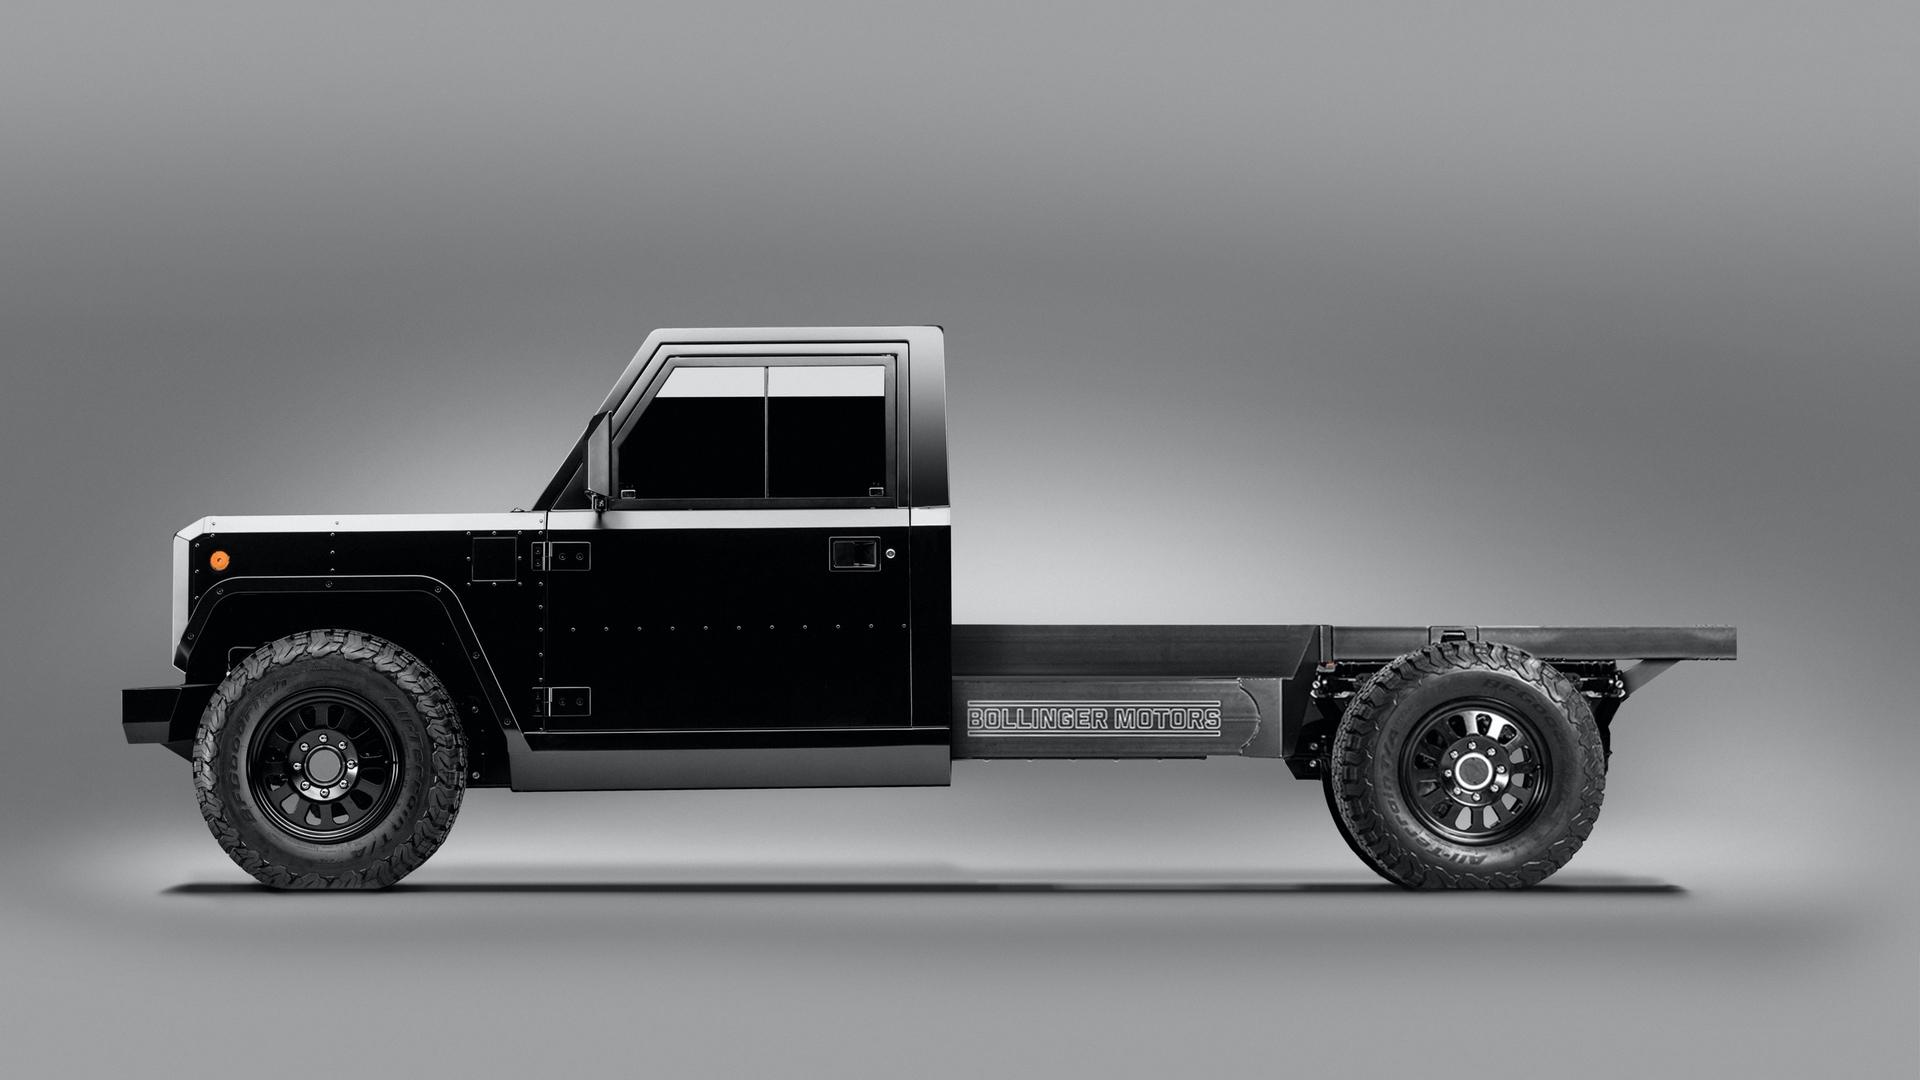 Bollinger-Motors-B2-Chassis-Cab-2-Door-side